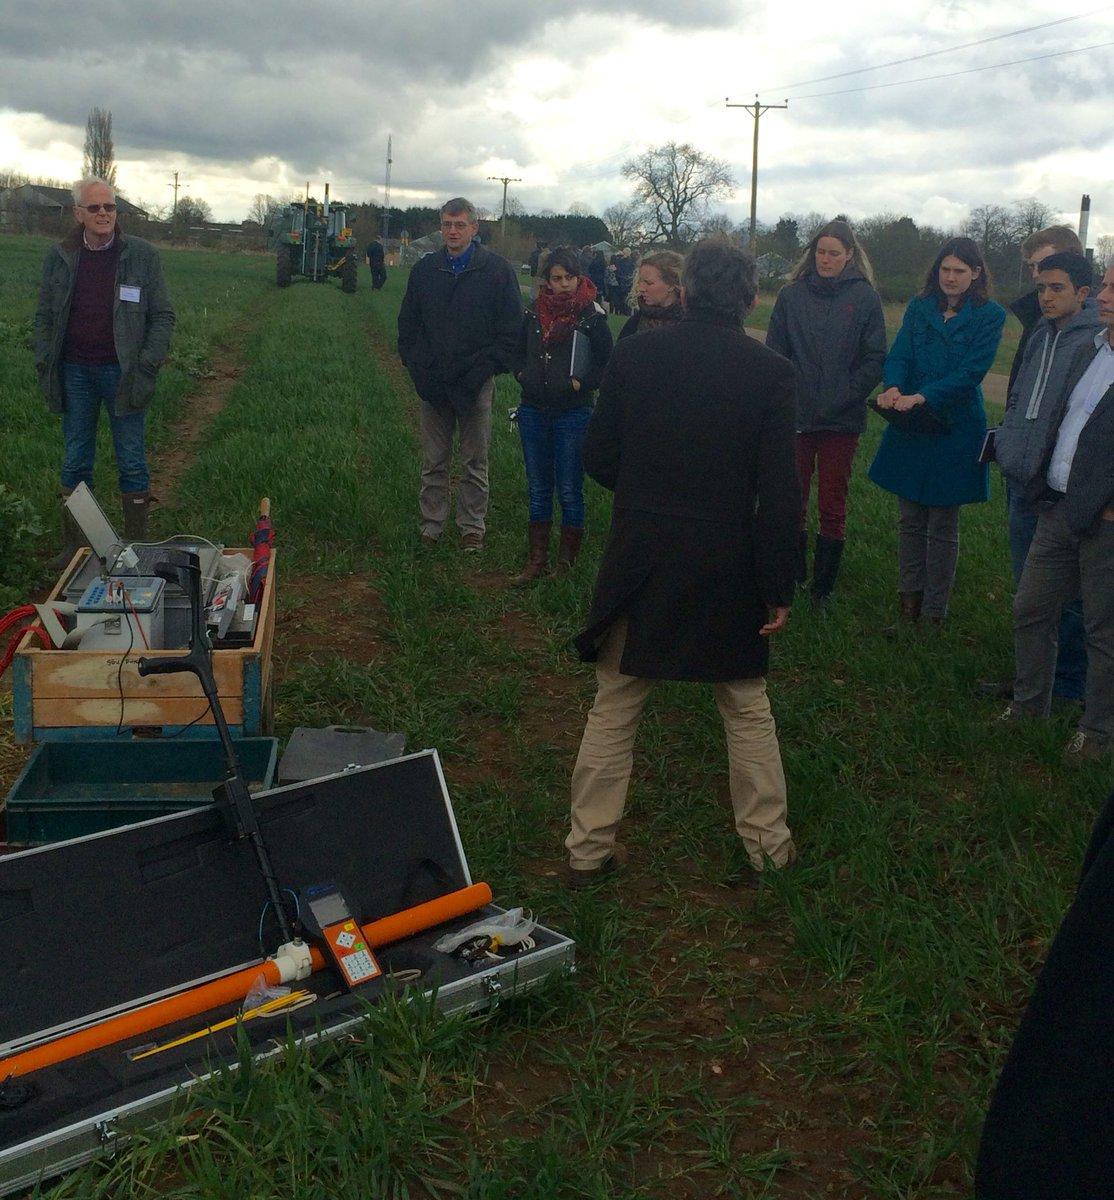 #ukppn Live action soil measurements demo w Andrew Binley @LancsUniLEC @cpib_news https://t.co/CMAtACusCr